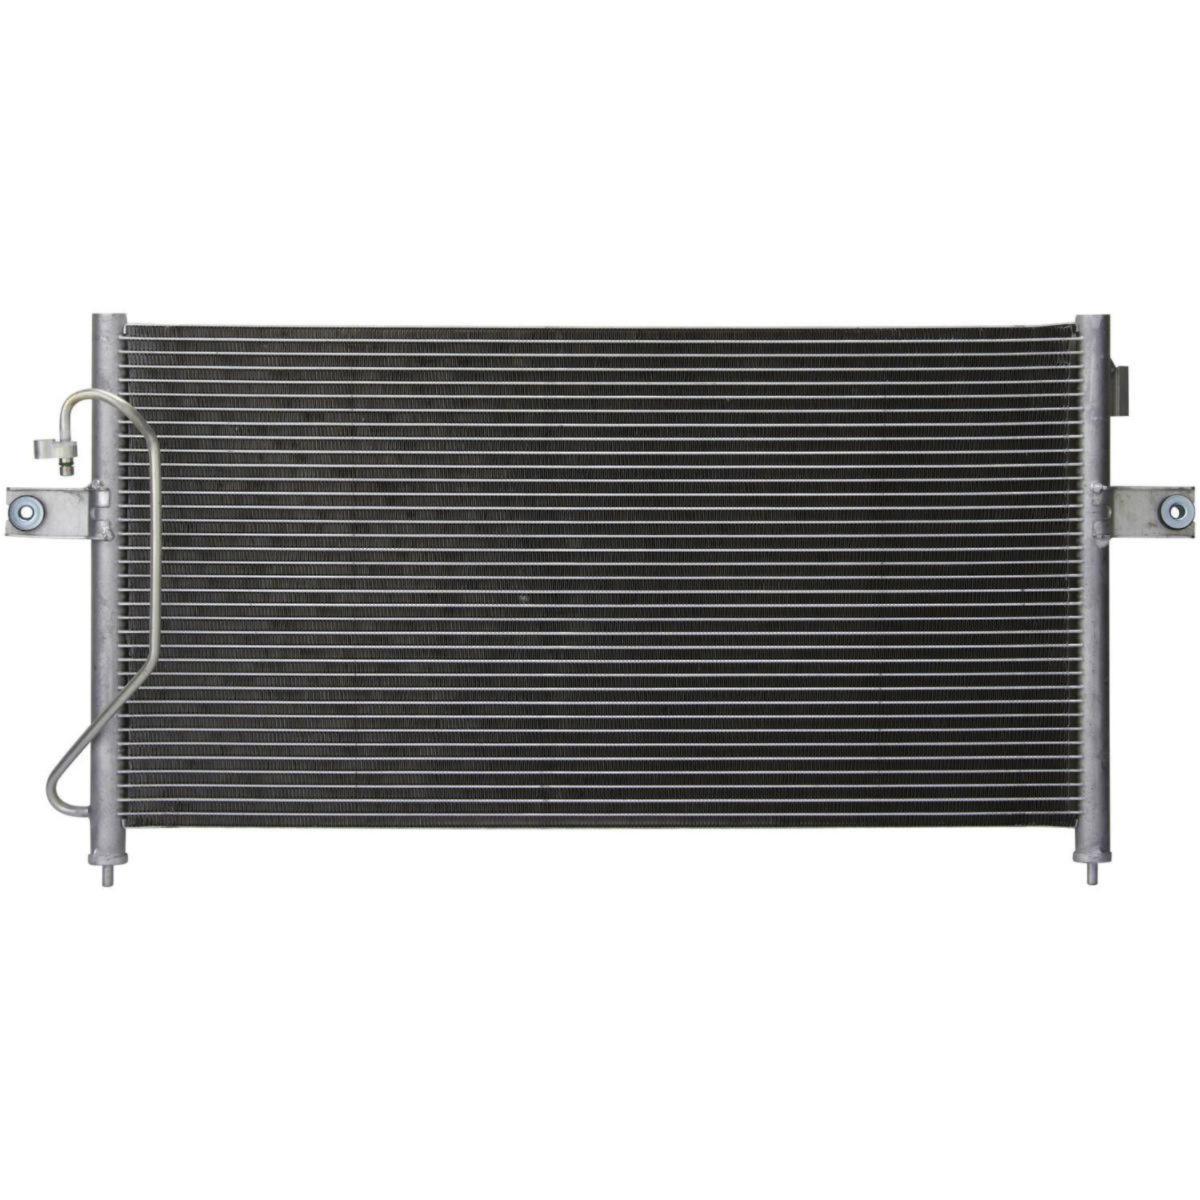 Condenser For Frontier 01-02 Xterra 00-02 2.4 L4 3.3 V6